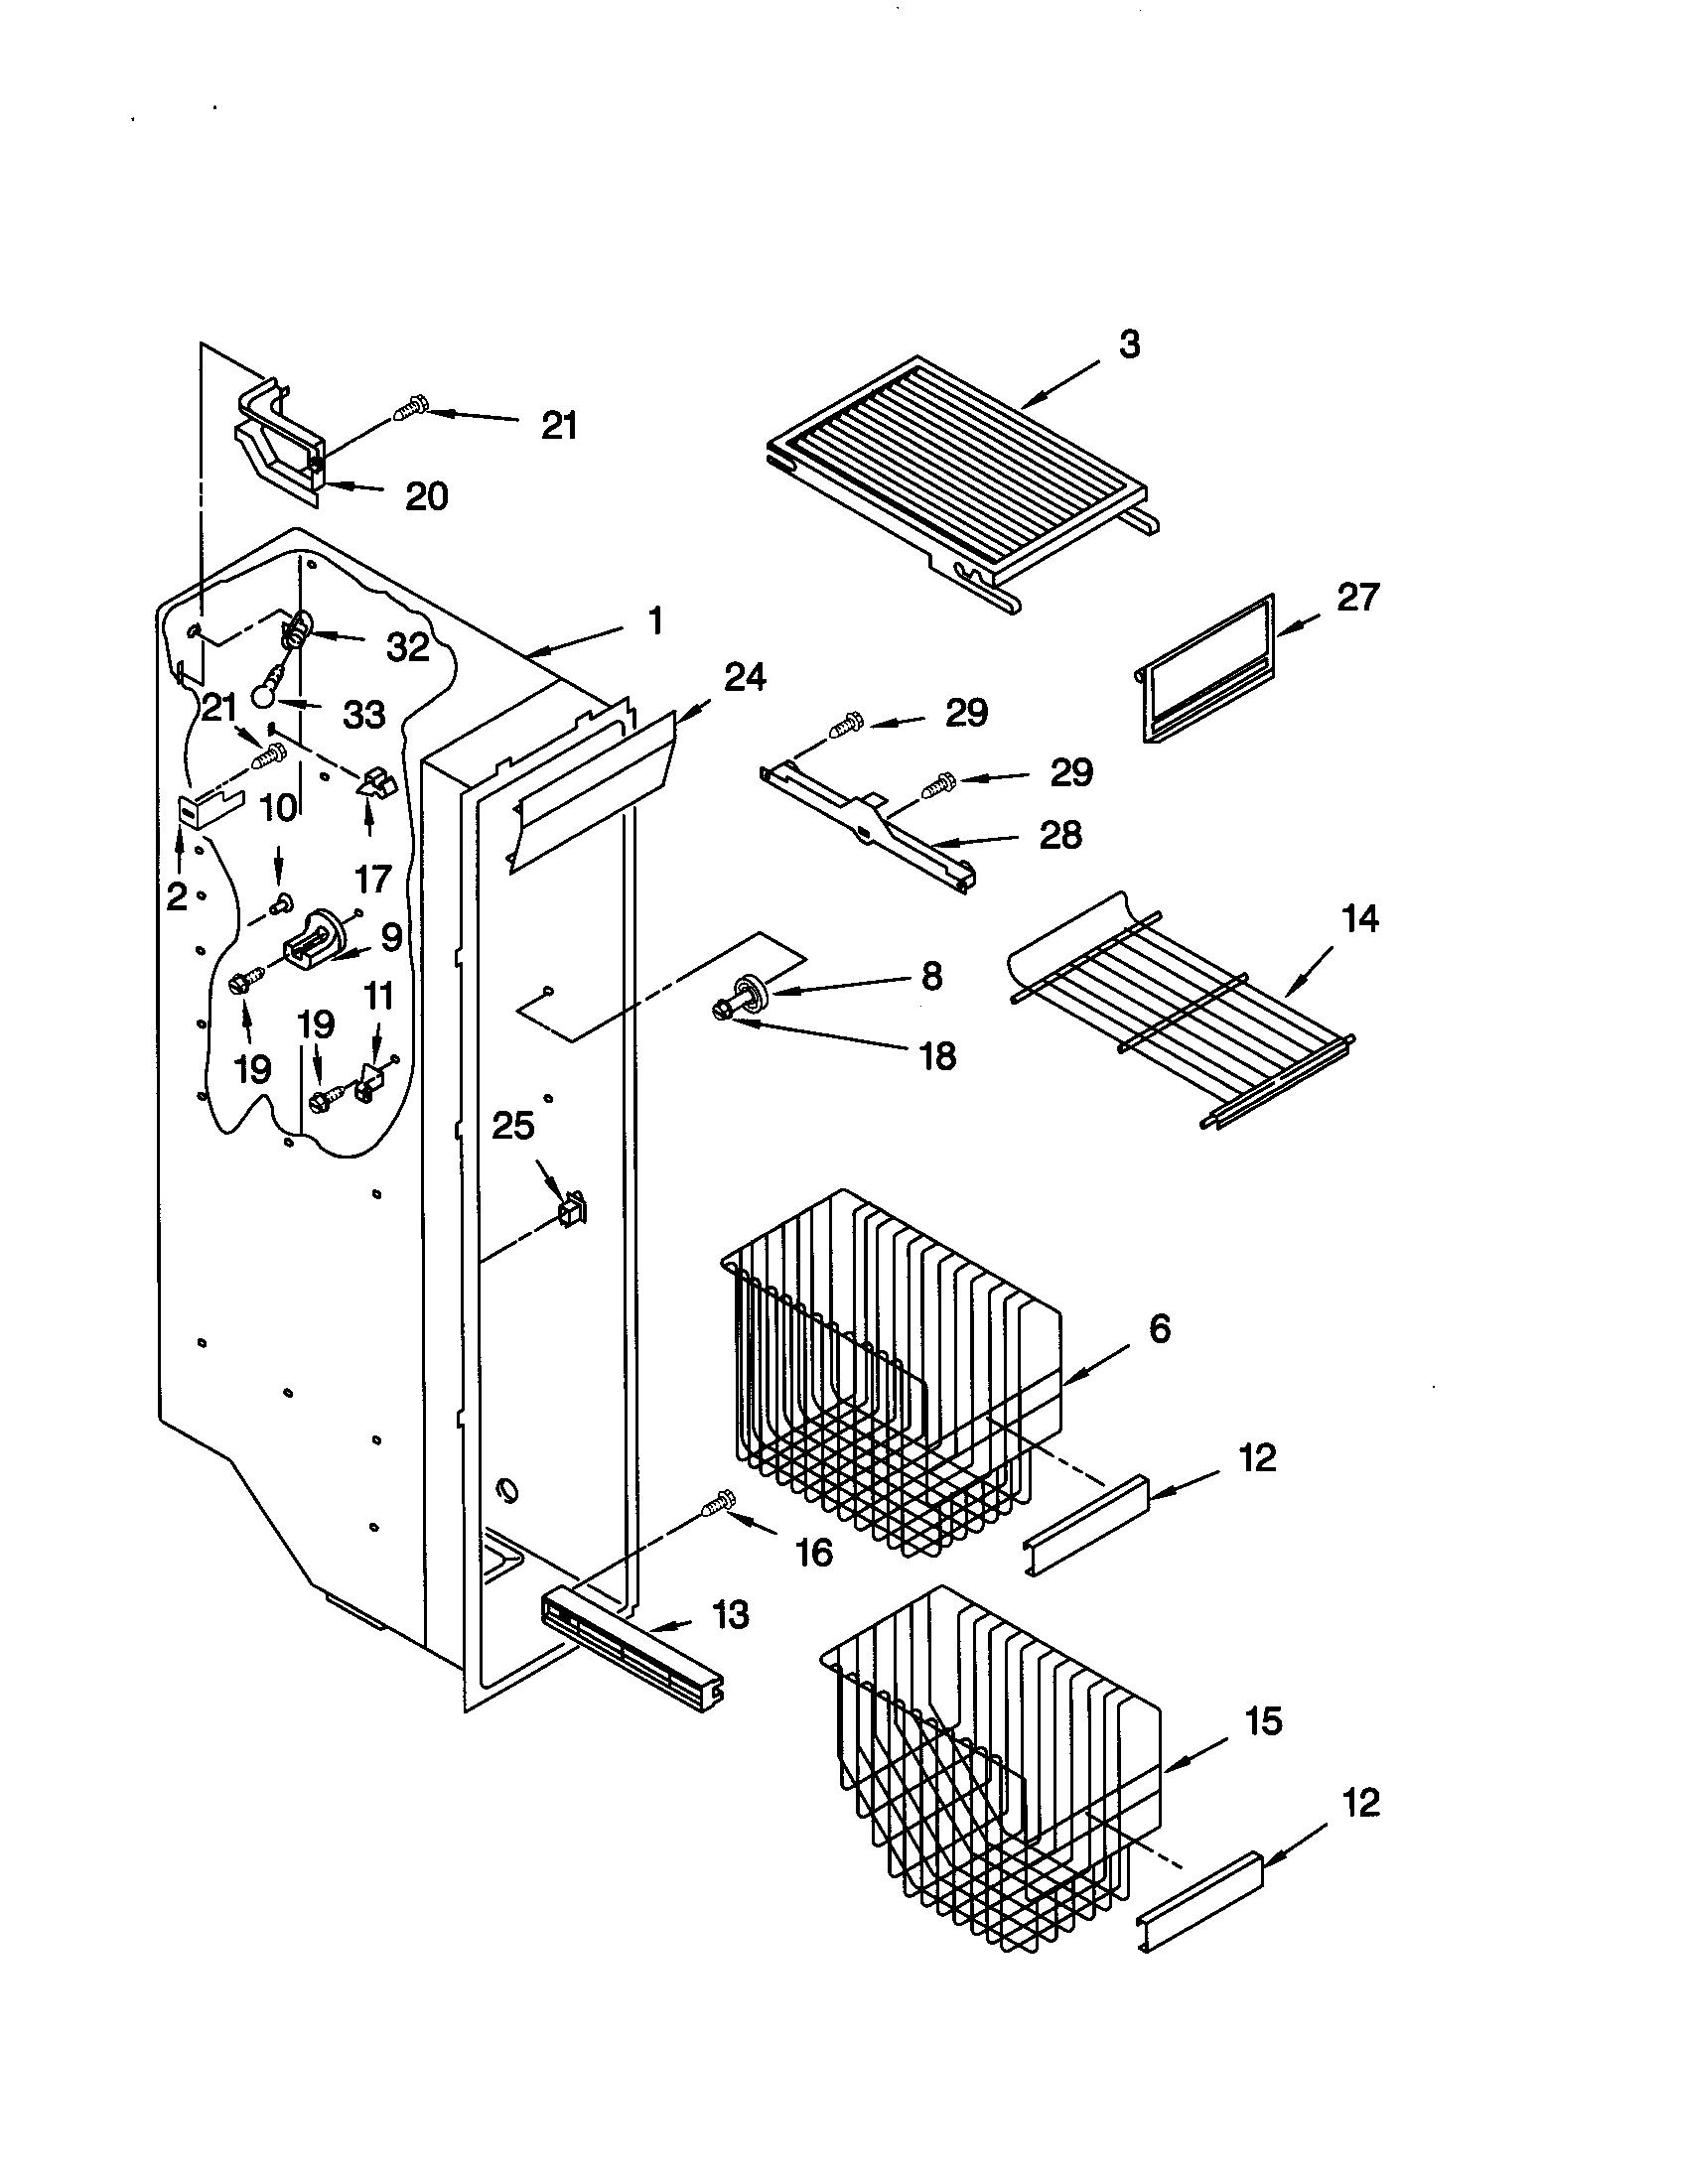 Kenmore model 10659599990 side-by-side refrigerator